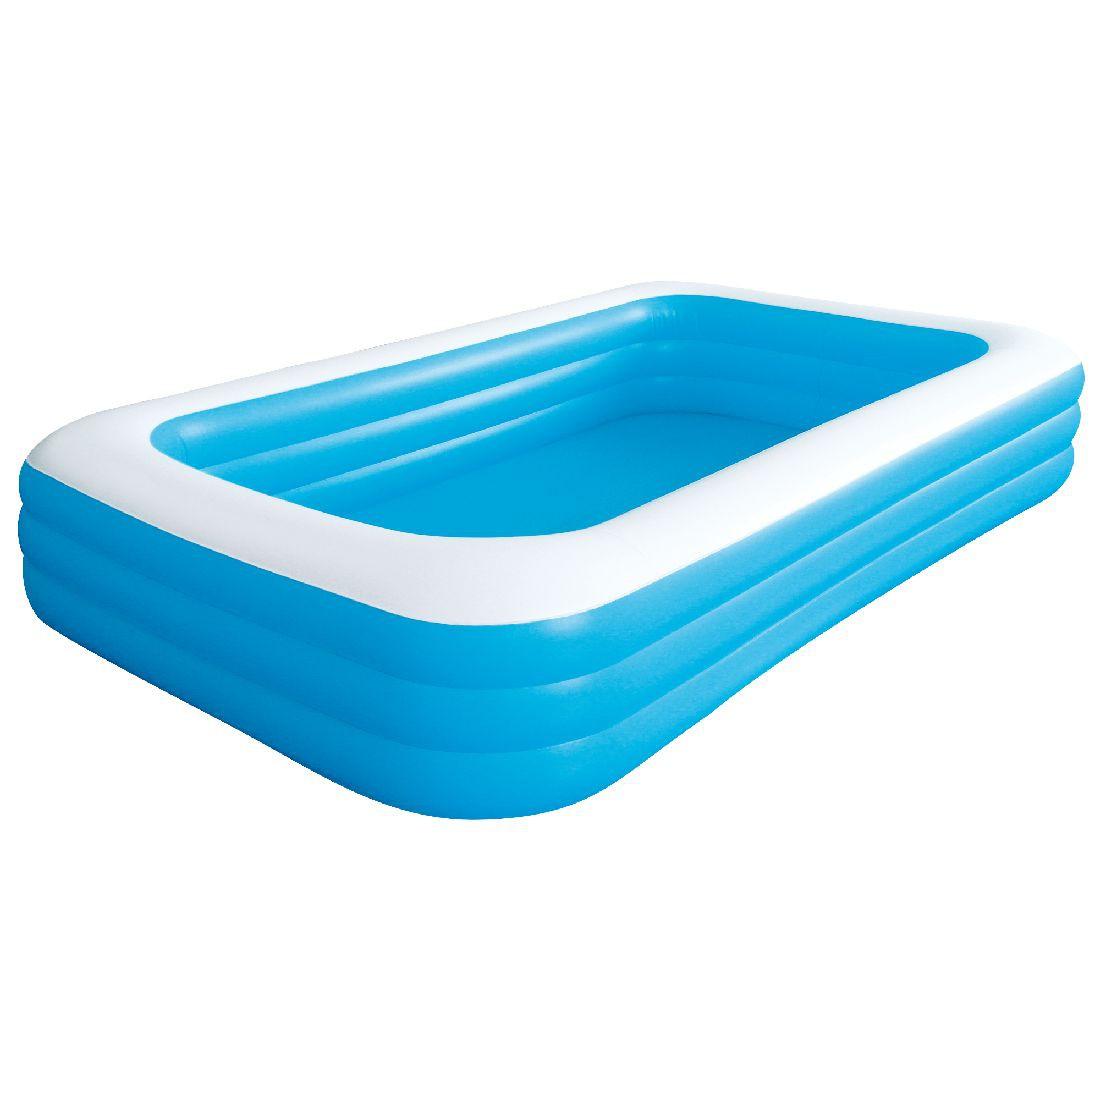 Comprare jilong giant pool 3r366 piscina familiare for Comprare piscina